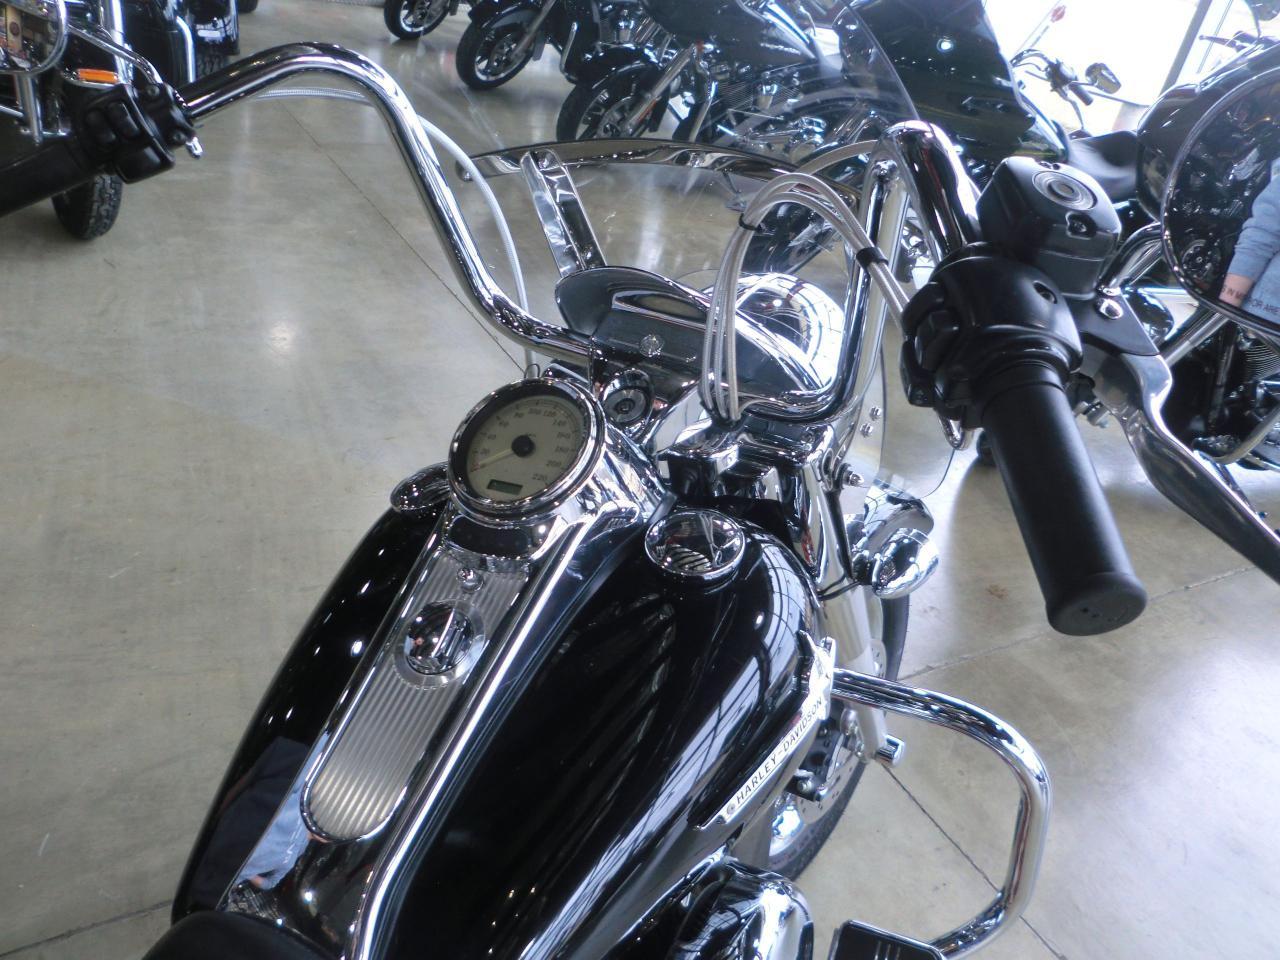 2007 Harley-Davidson FLHR